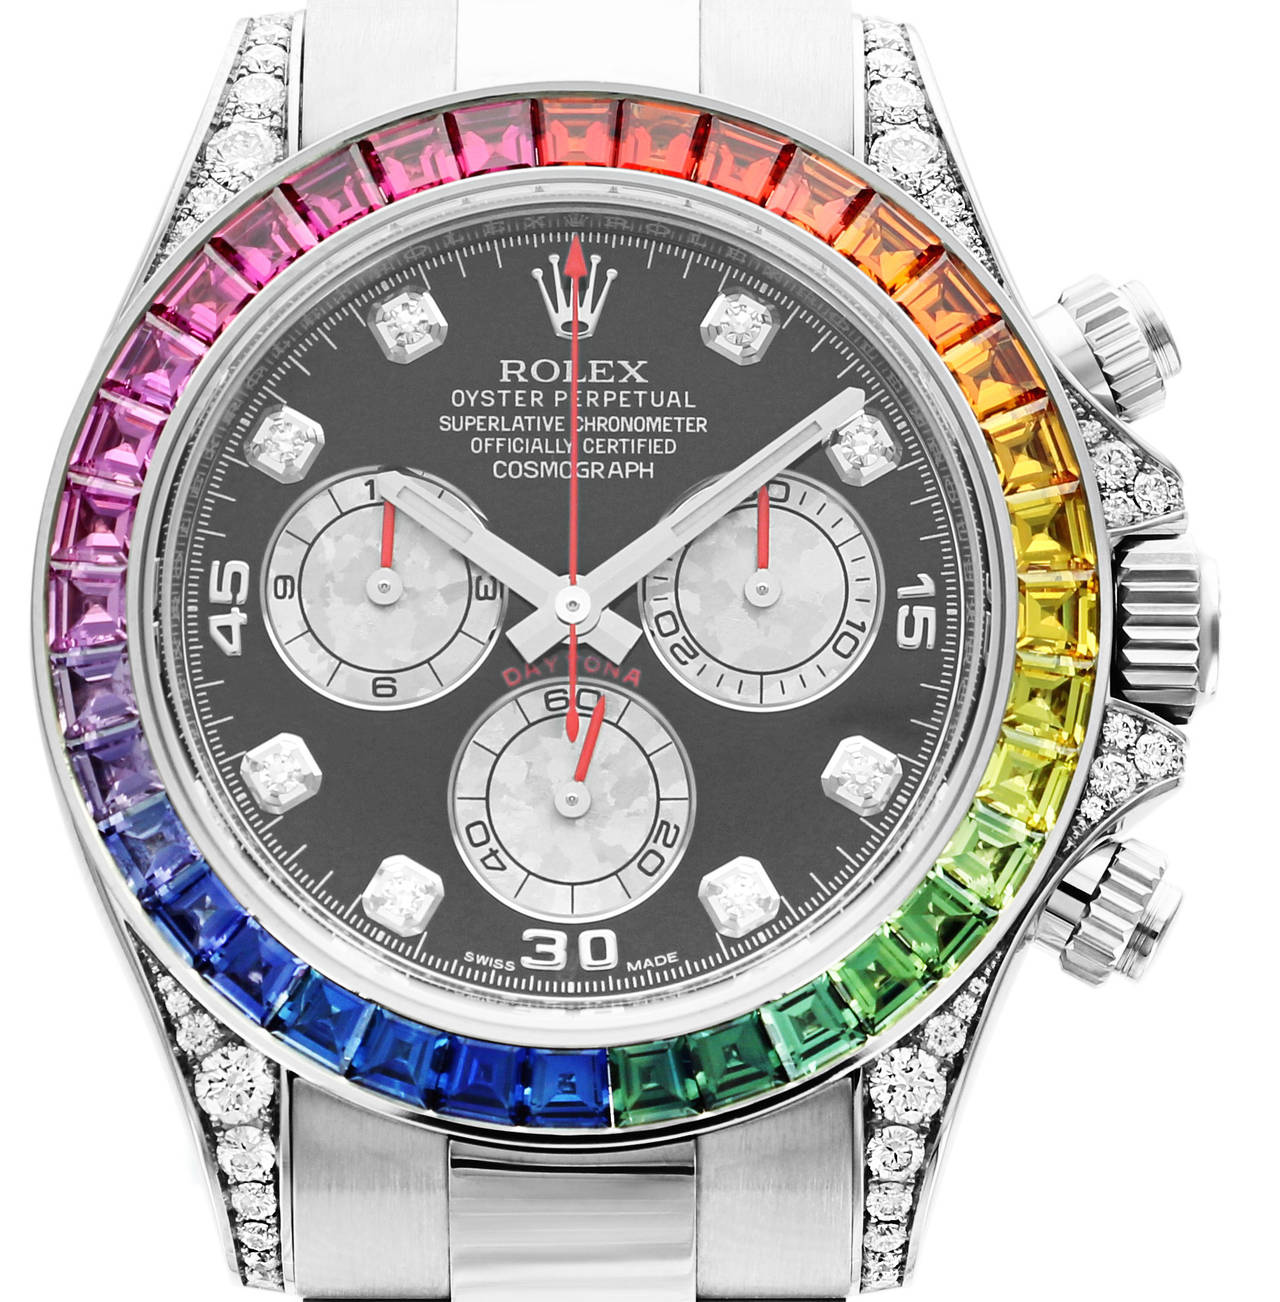 Rolex White Gold Daytona Rainbow Chronometer Wristwatch Ref 116599 2